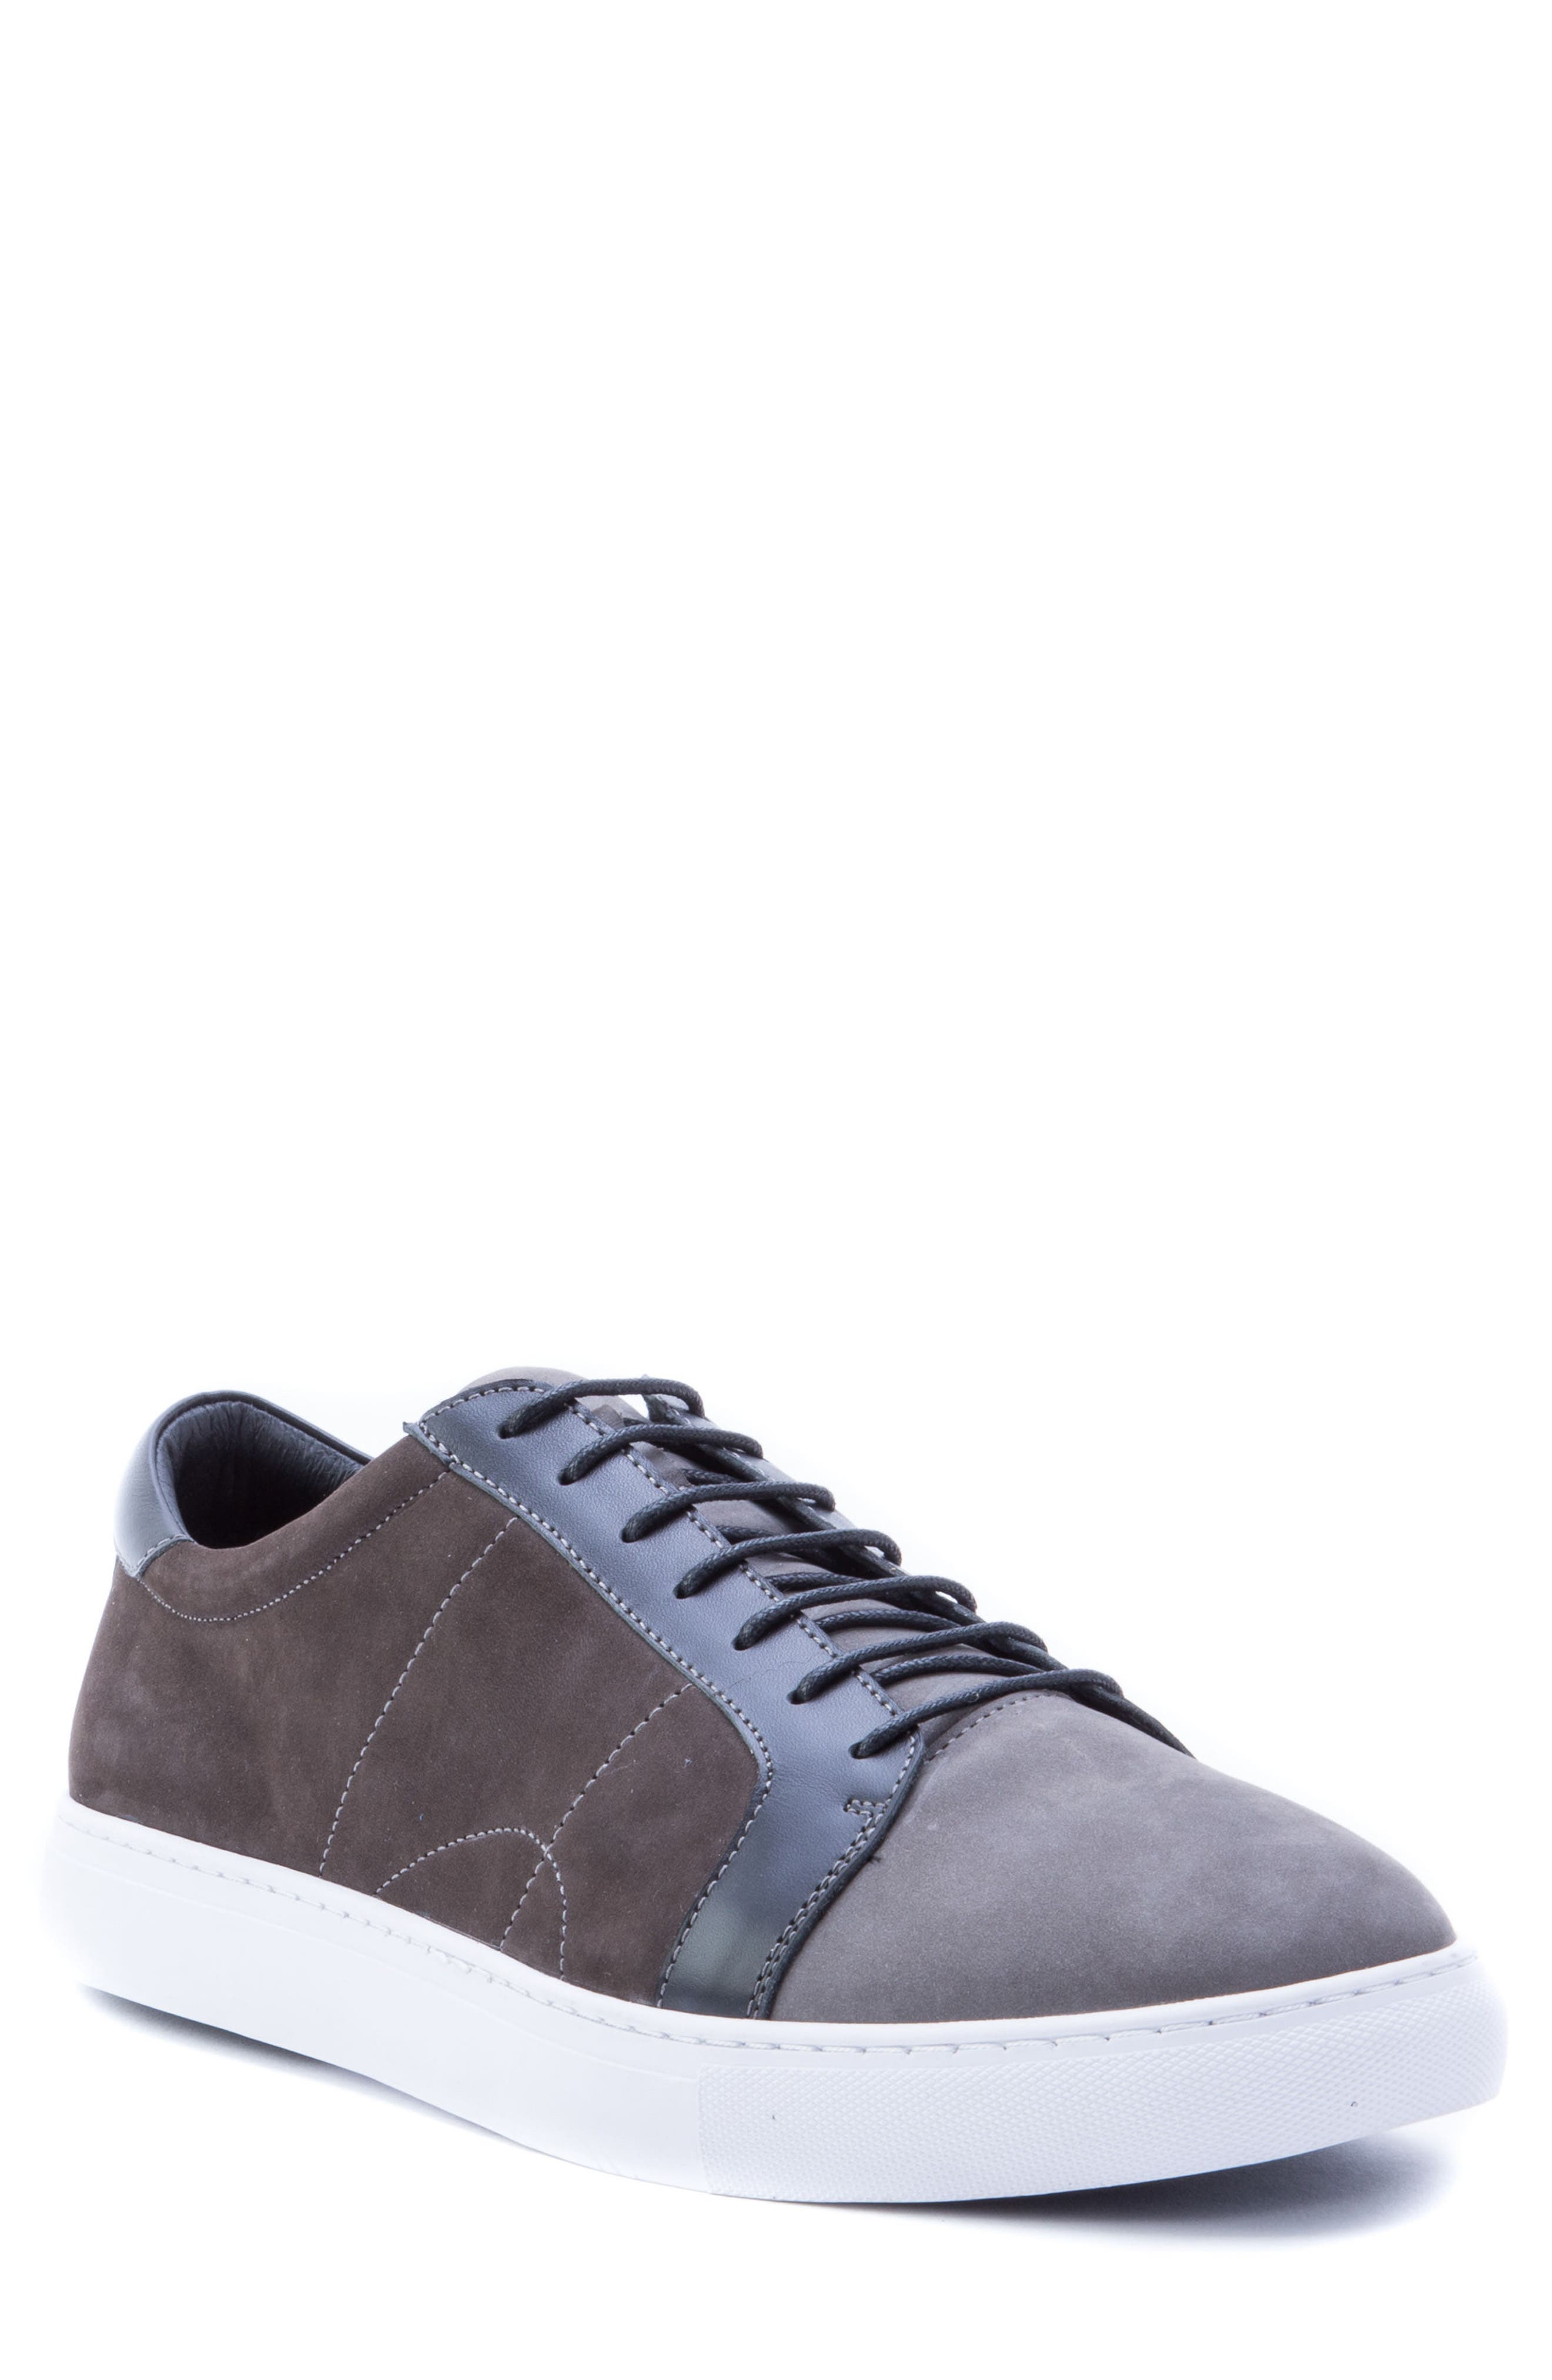 ROBERT GRAHAM, Gonzalo Low Top Sneaker, Main thumbnail 1, color, GREY SUEDE